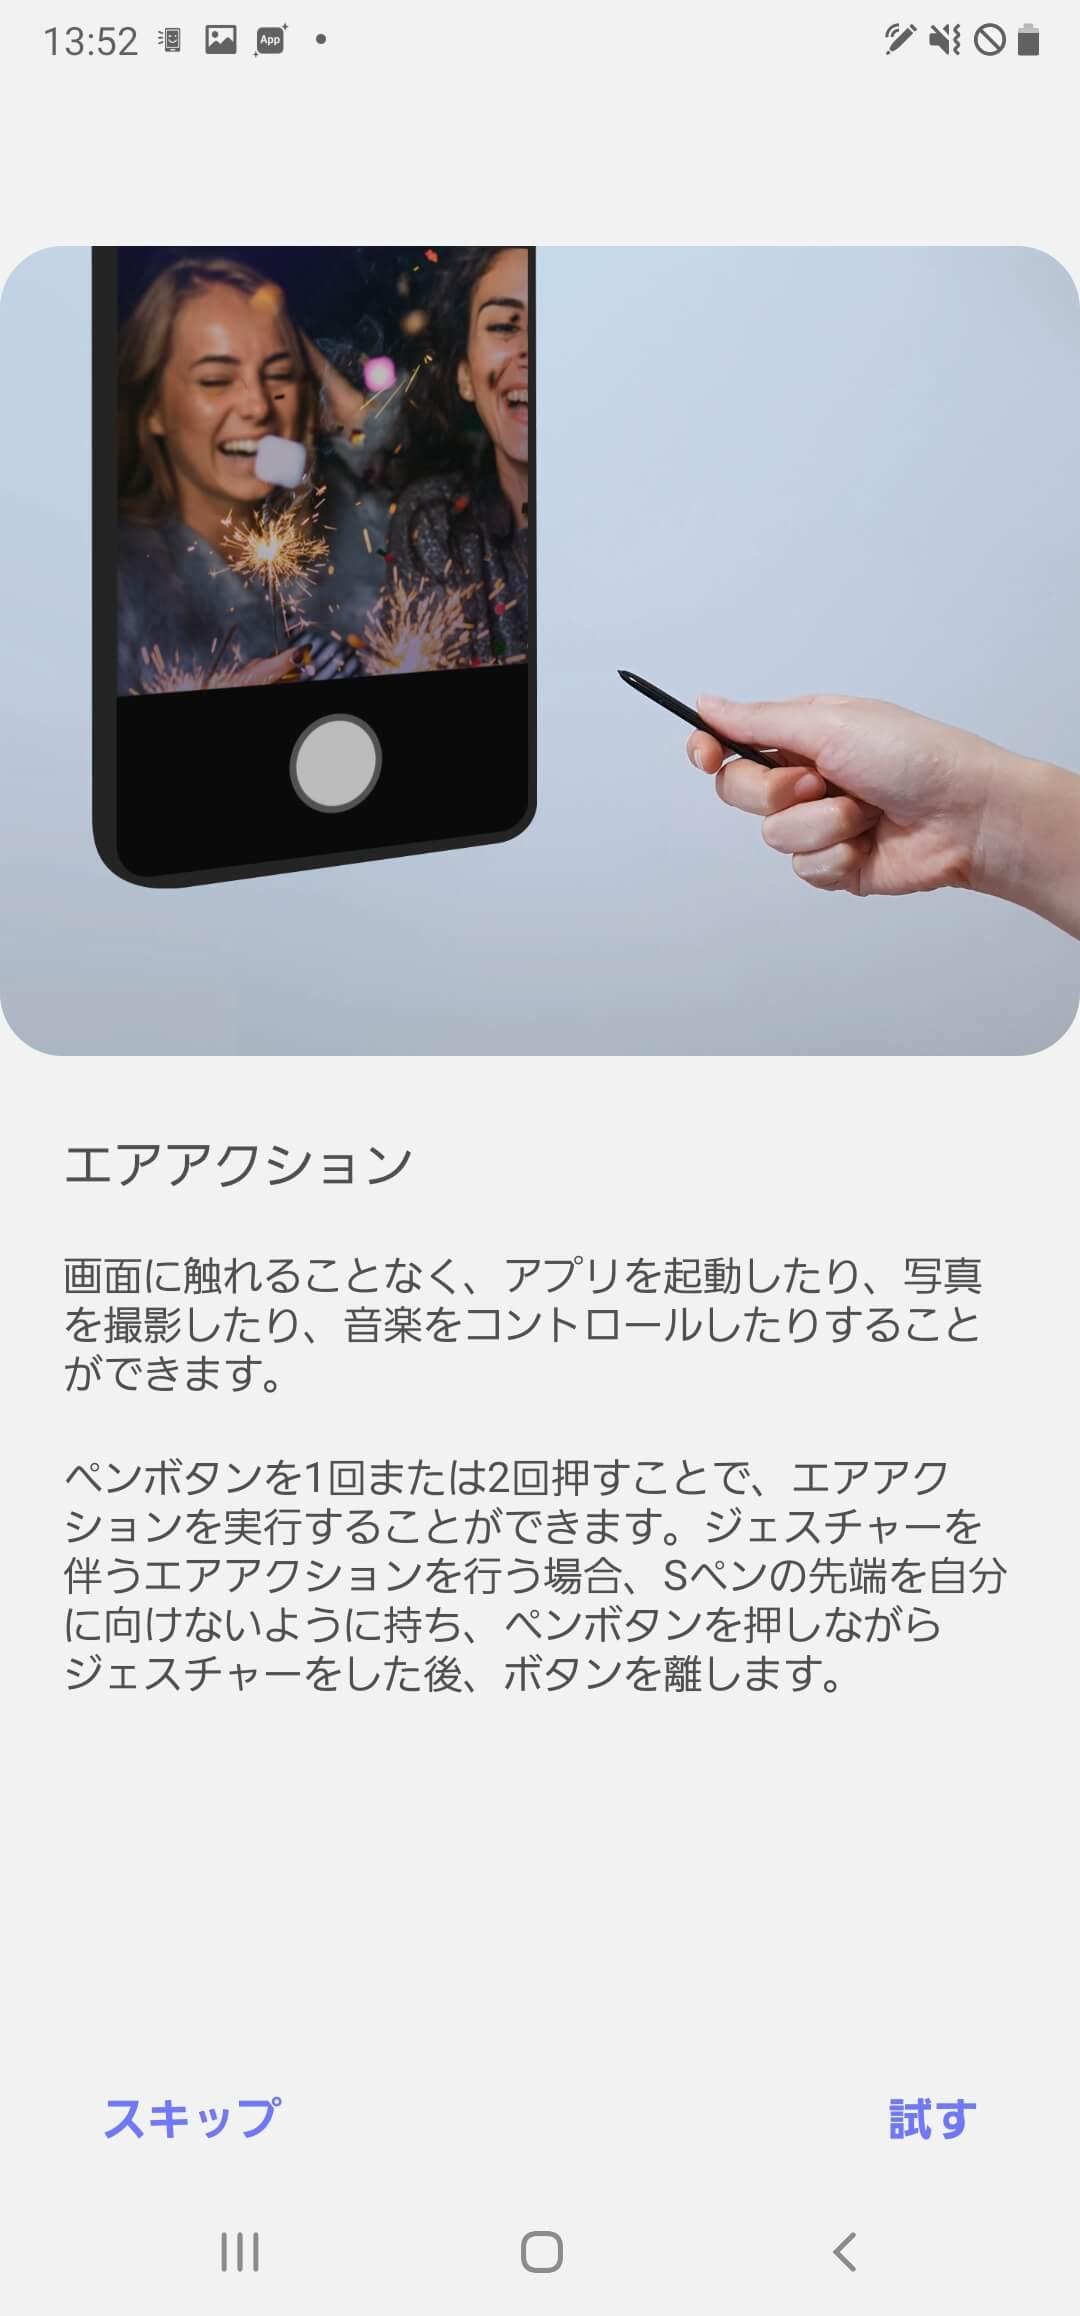 Galaxy Note20 Ultra 5Gのエアアクション